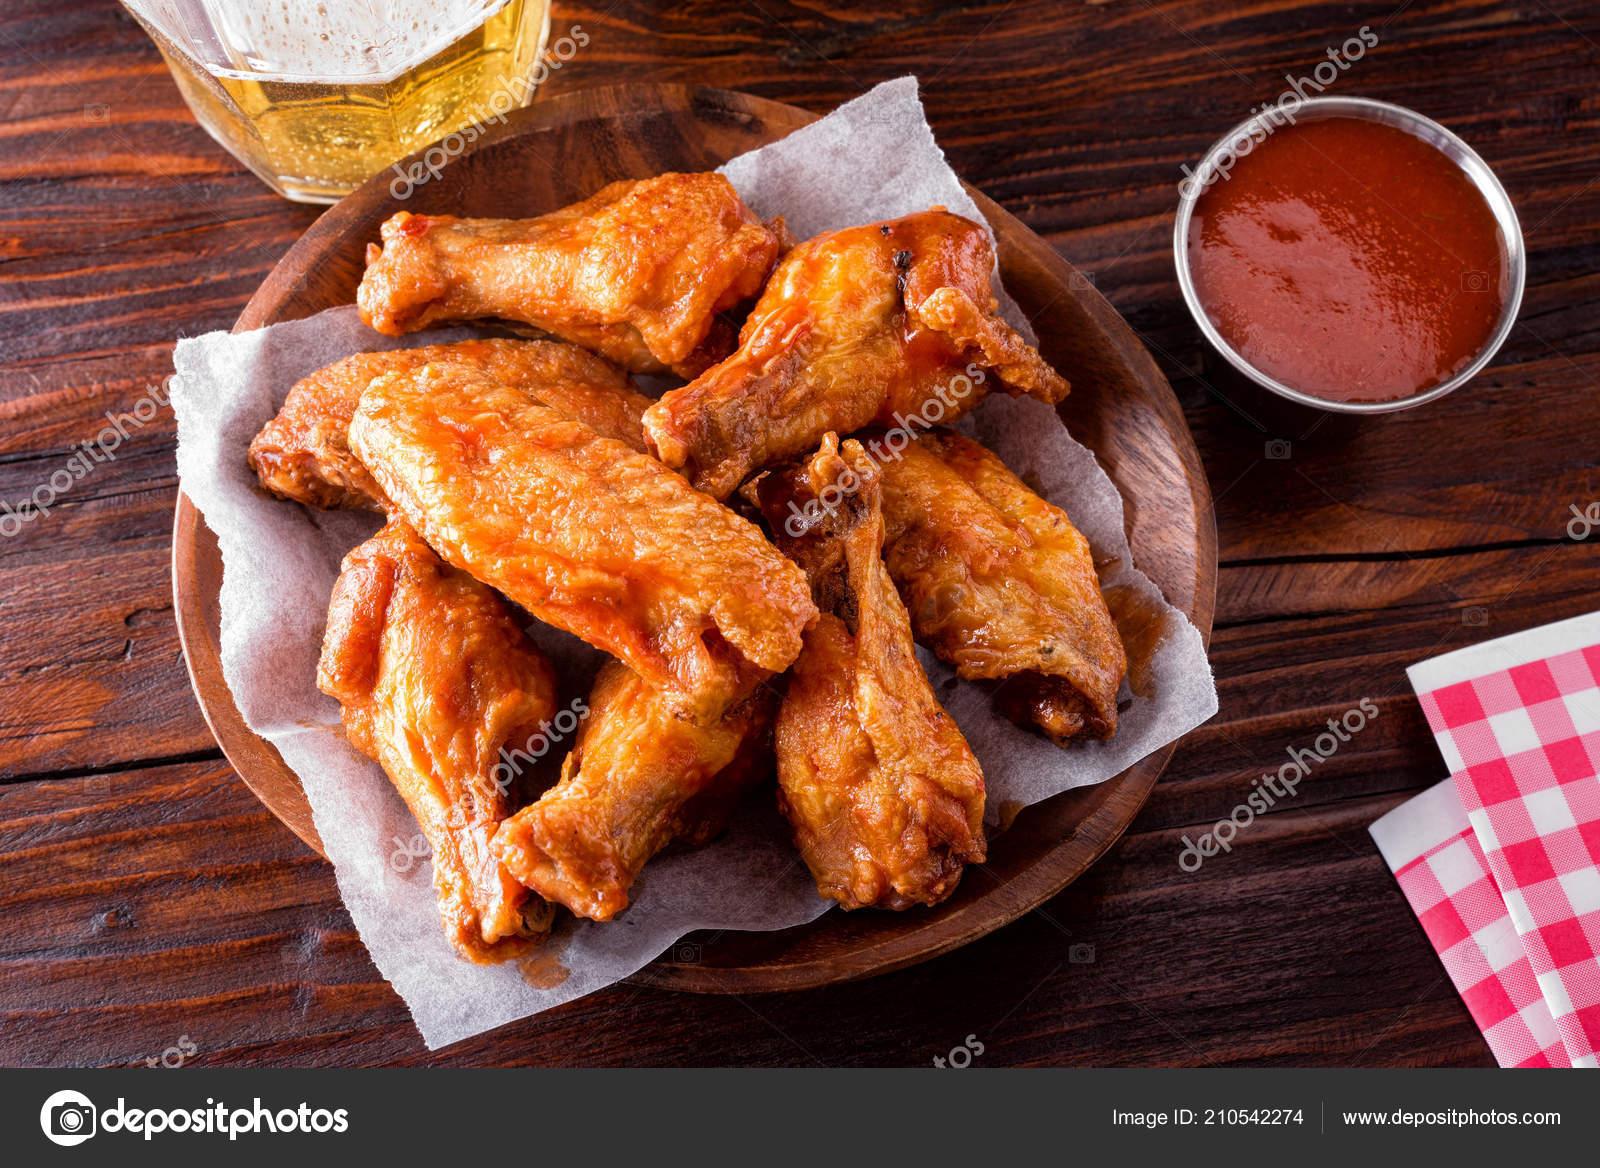 Serving Delicious Spicy Buffalo Chicken Wings Restaurant